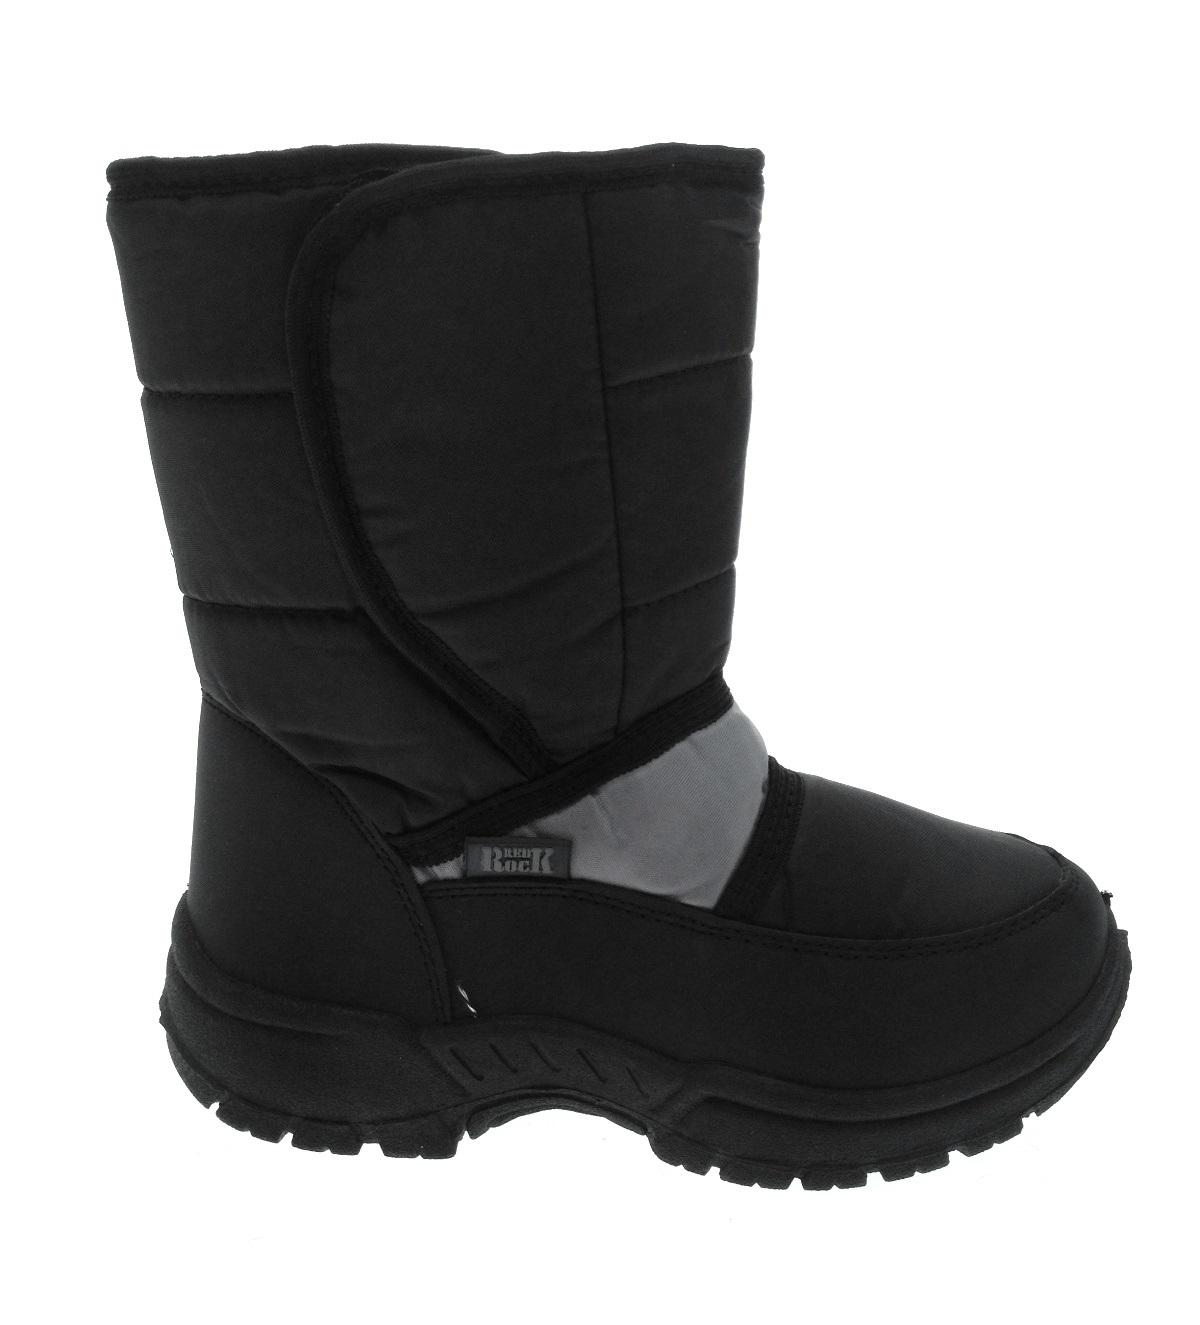 Kids Girls Boys Ladies Waterproof Sole Snow Boots Mucker